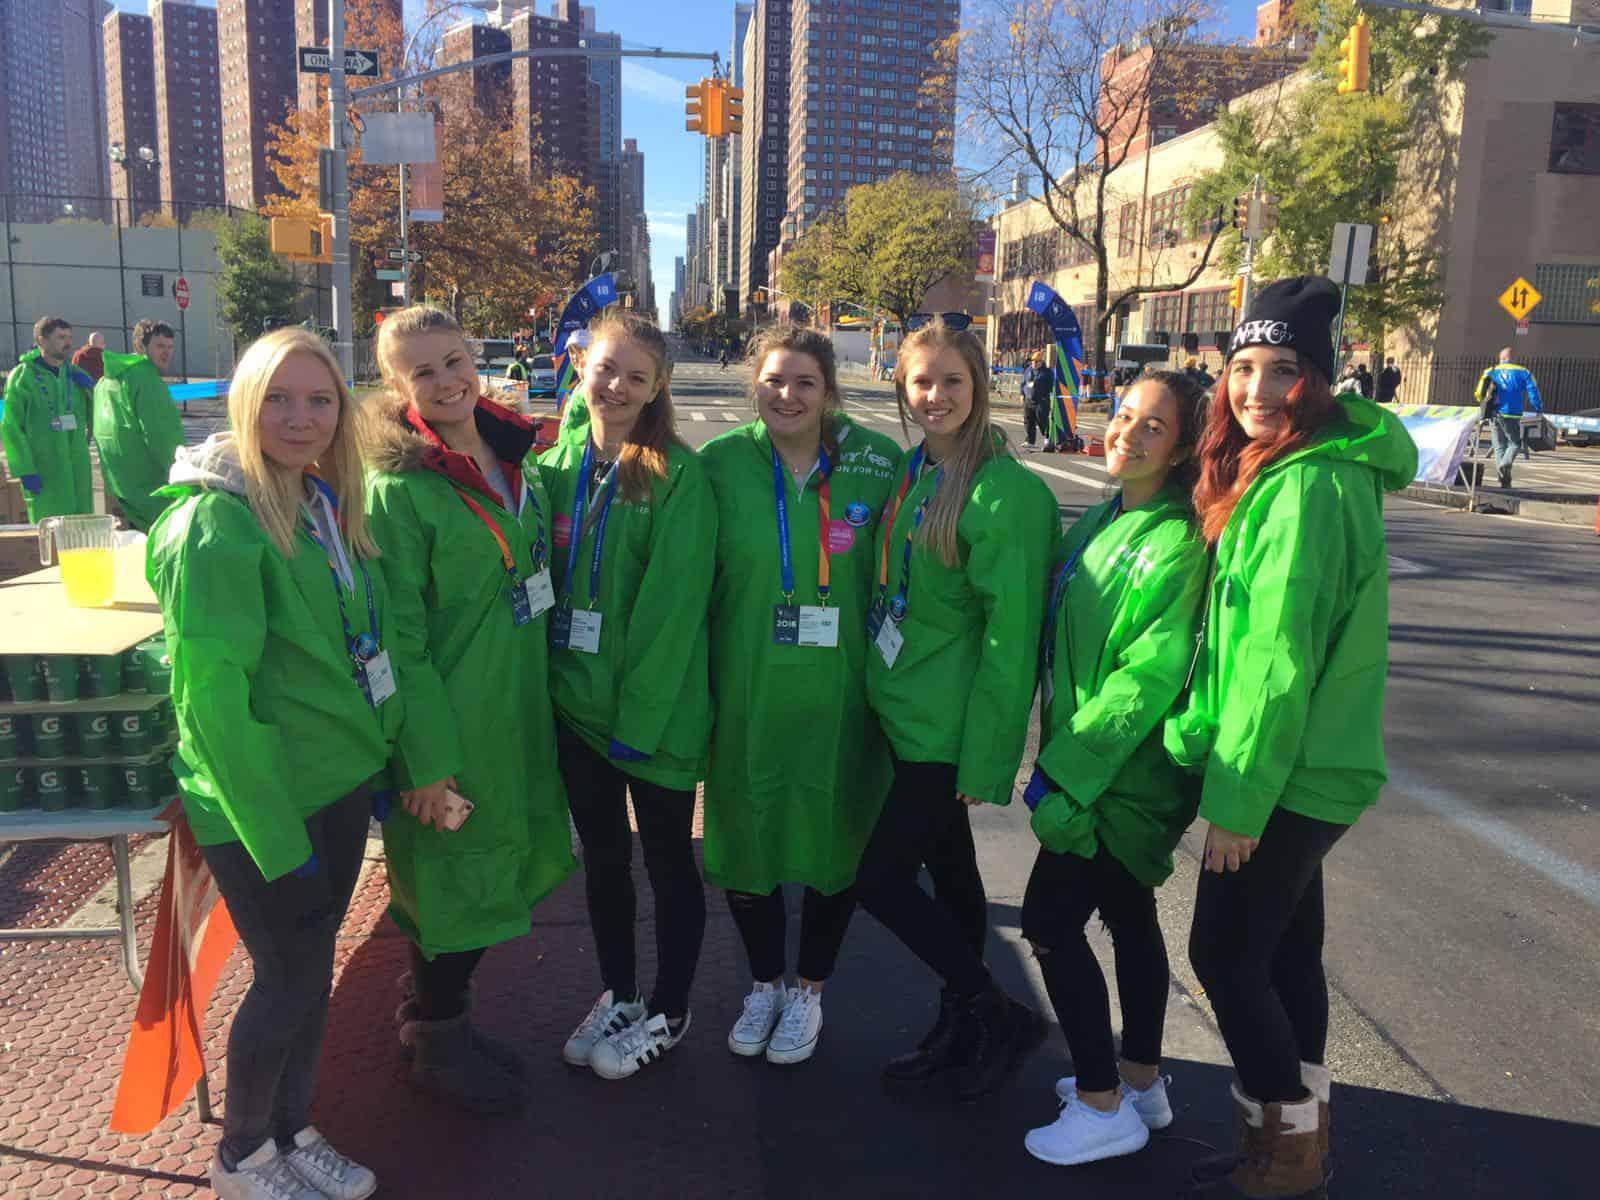 Meet our New York Marathon 2018 Team